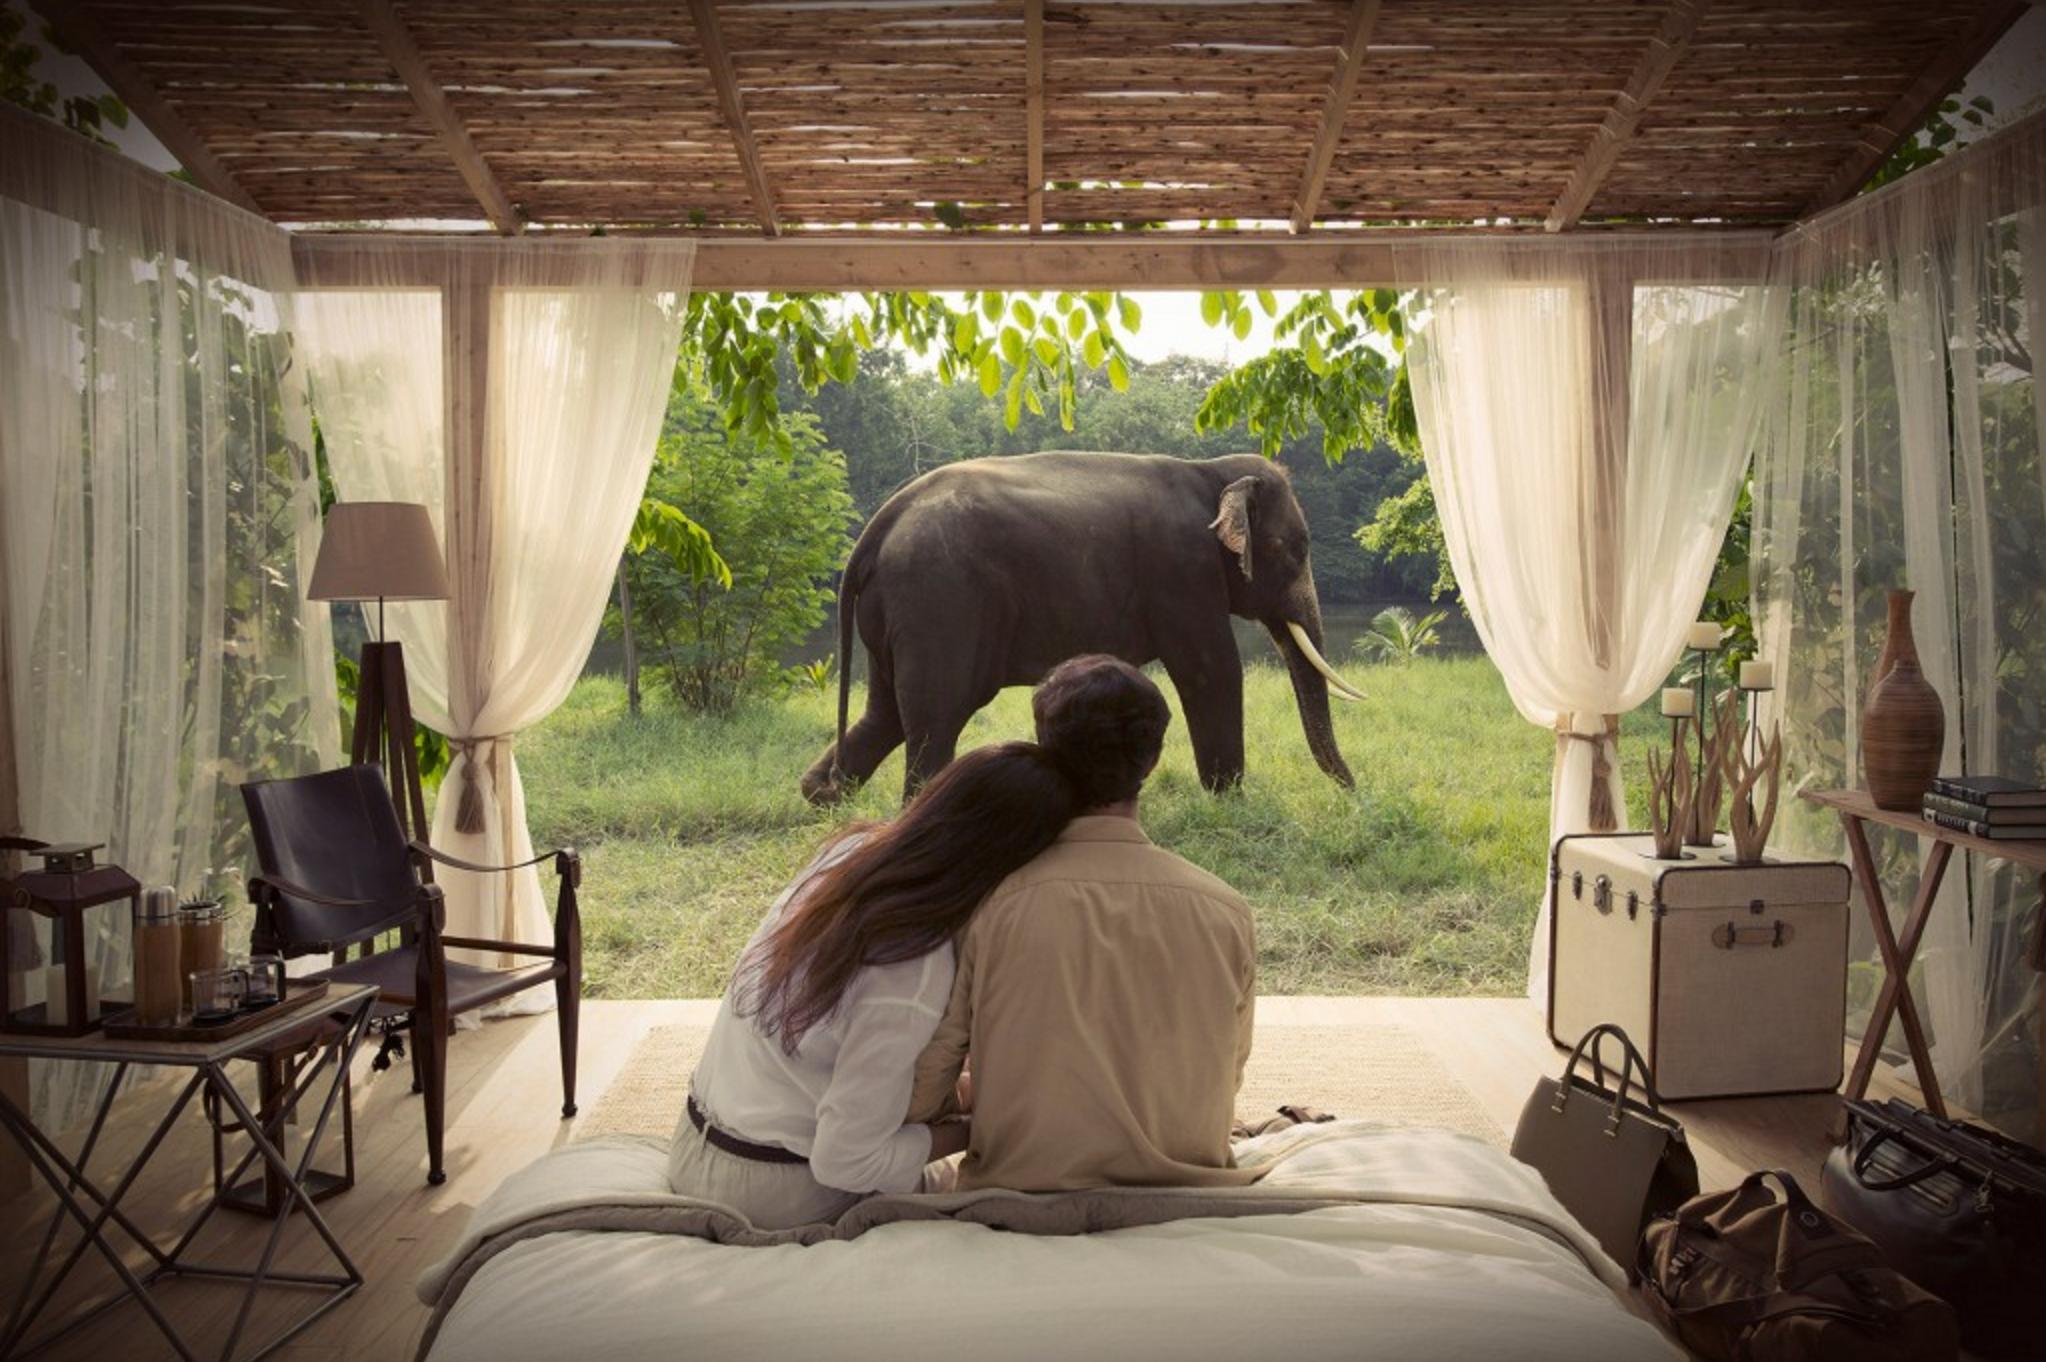 086 VISA_Thailand Elephant.png